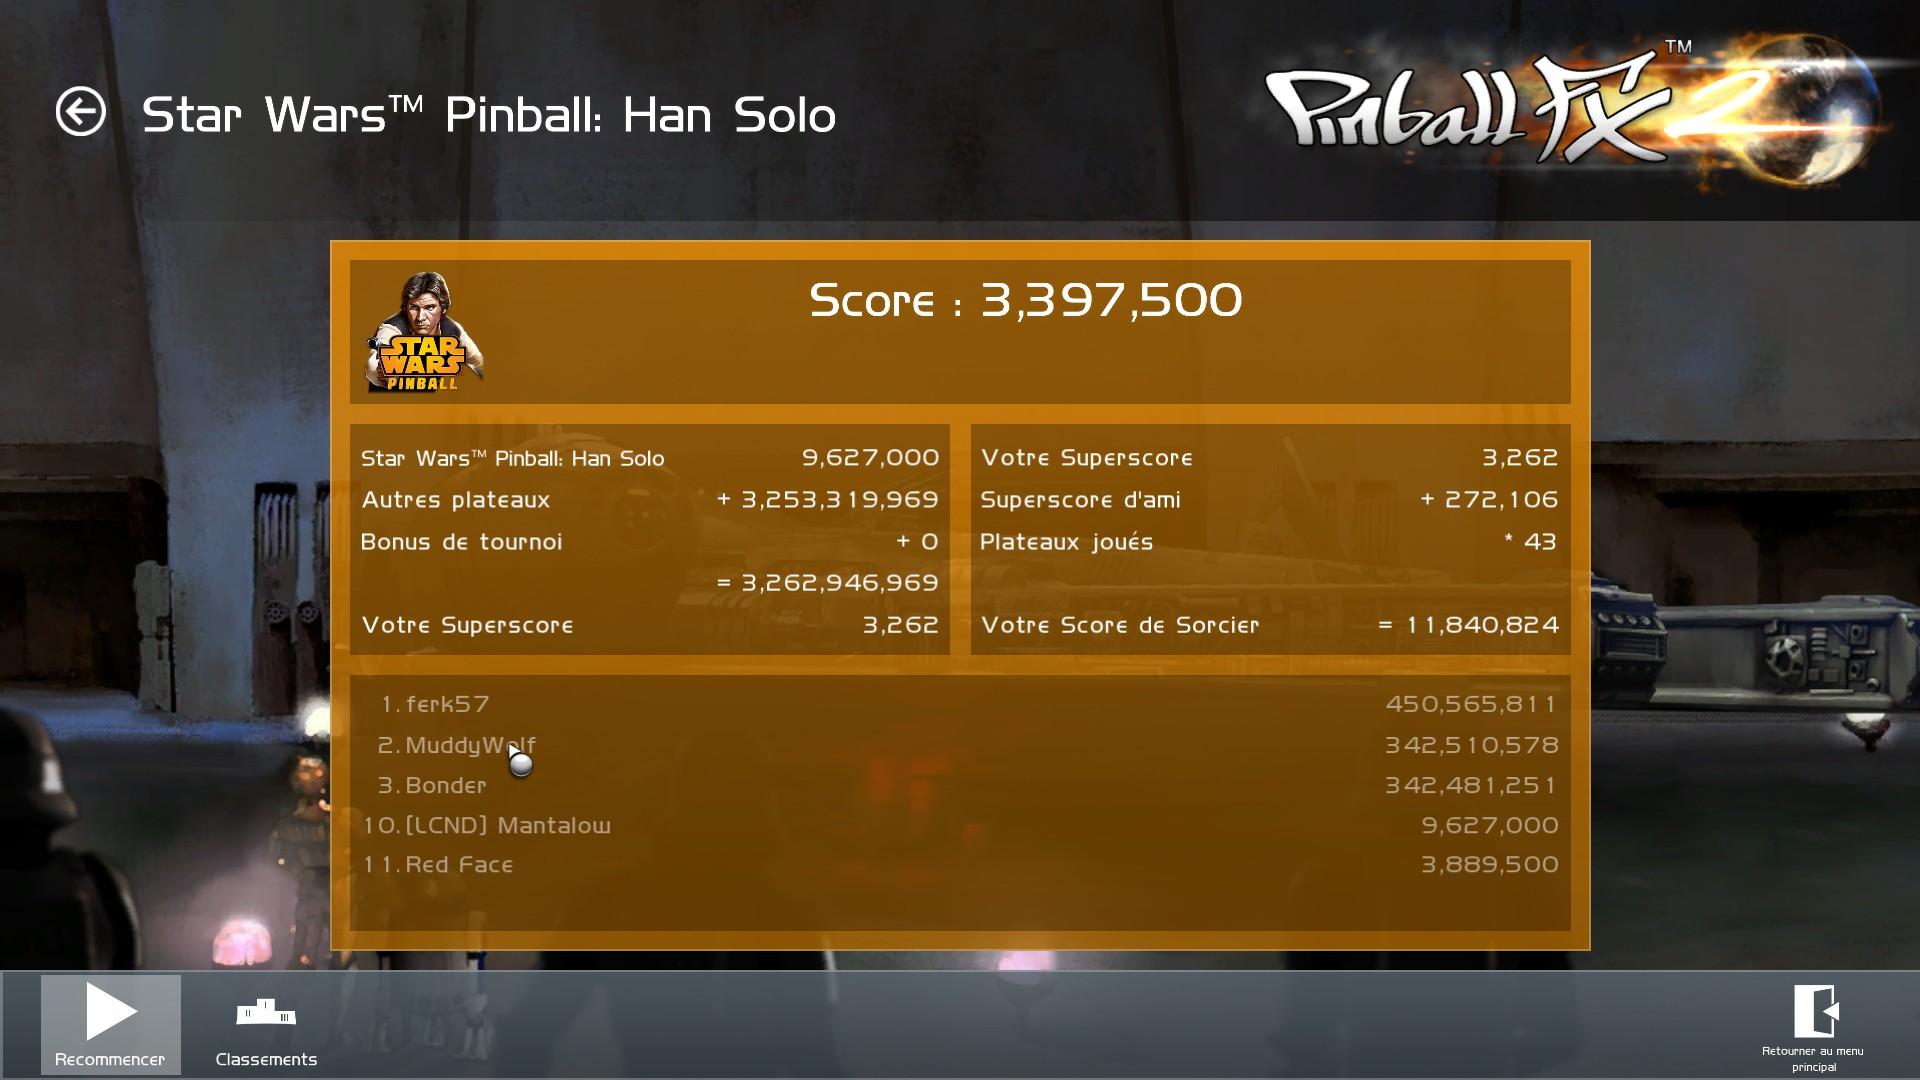 Mantalow: Pinball FX 2: Star Wars Pinball: Han Solo (PC) 3,397,500 points on 2015-03-05 10:00:25